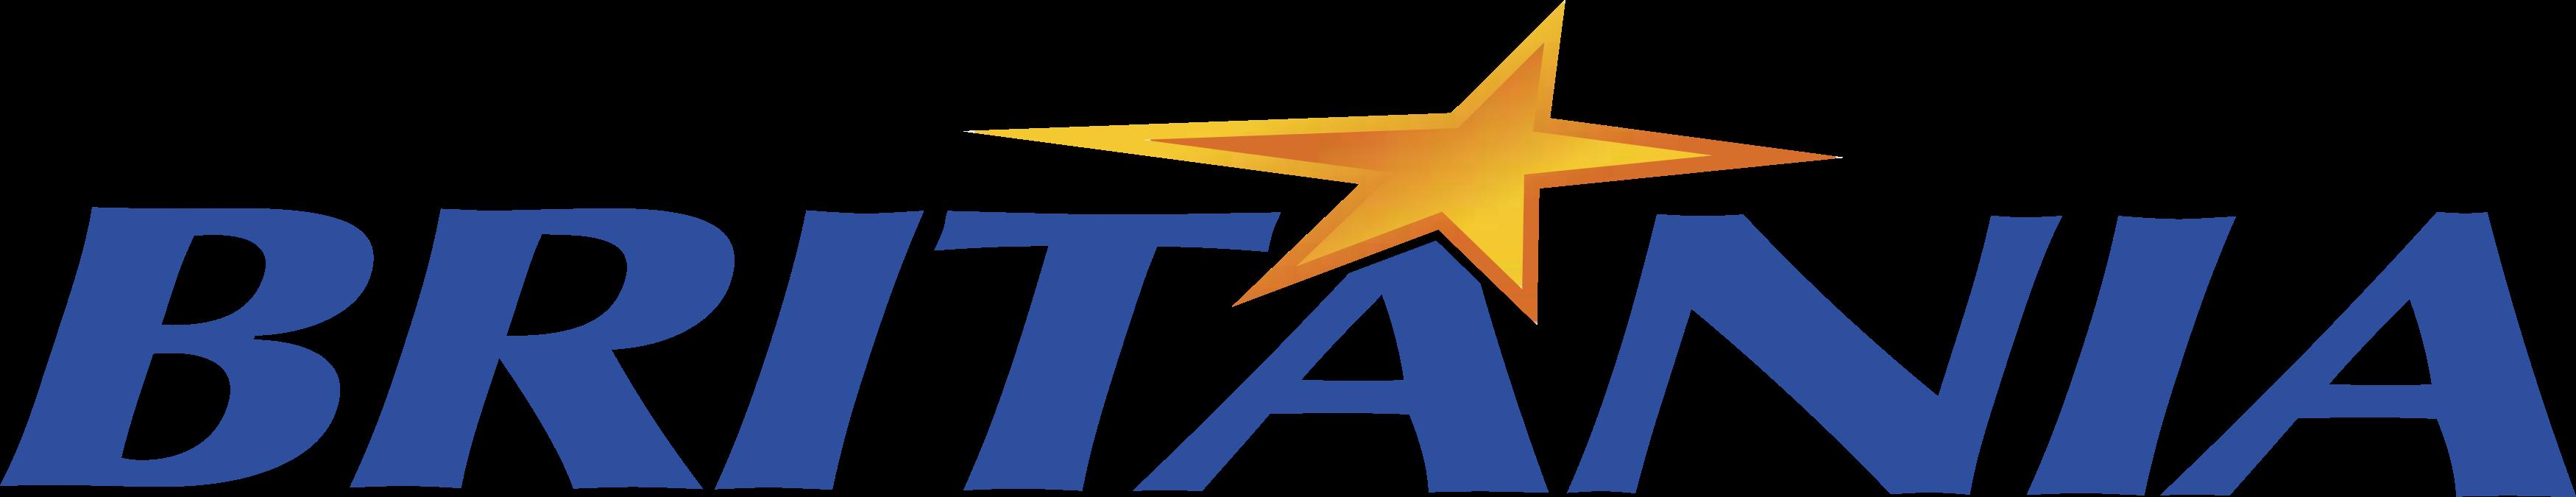 Logo da marca britania